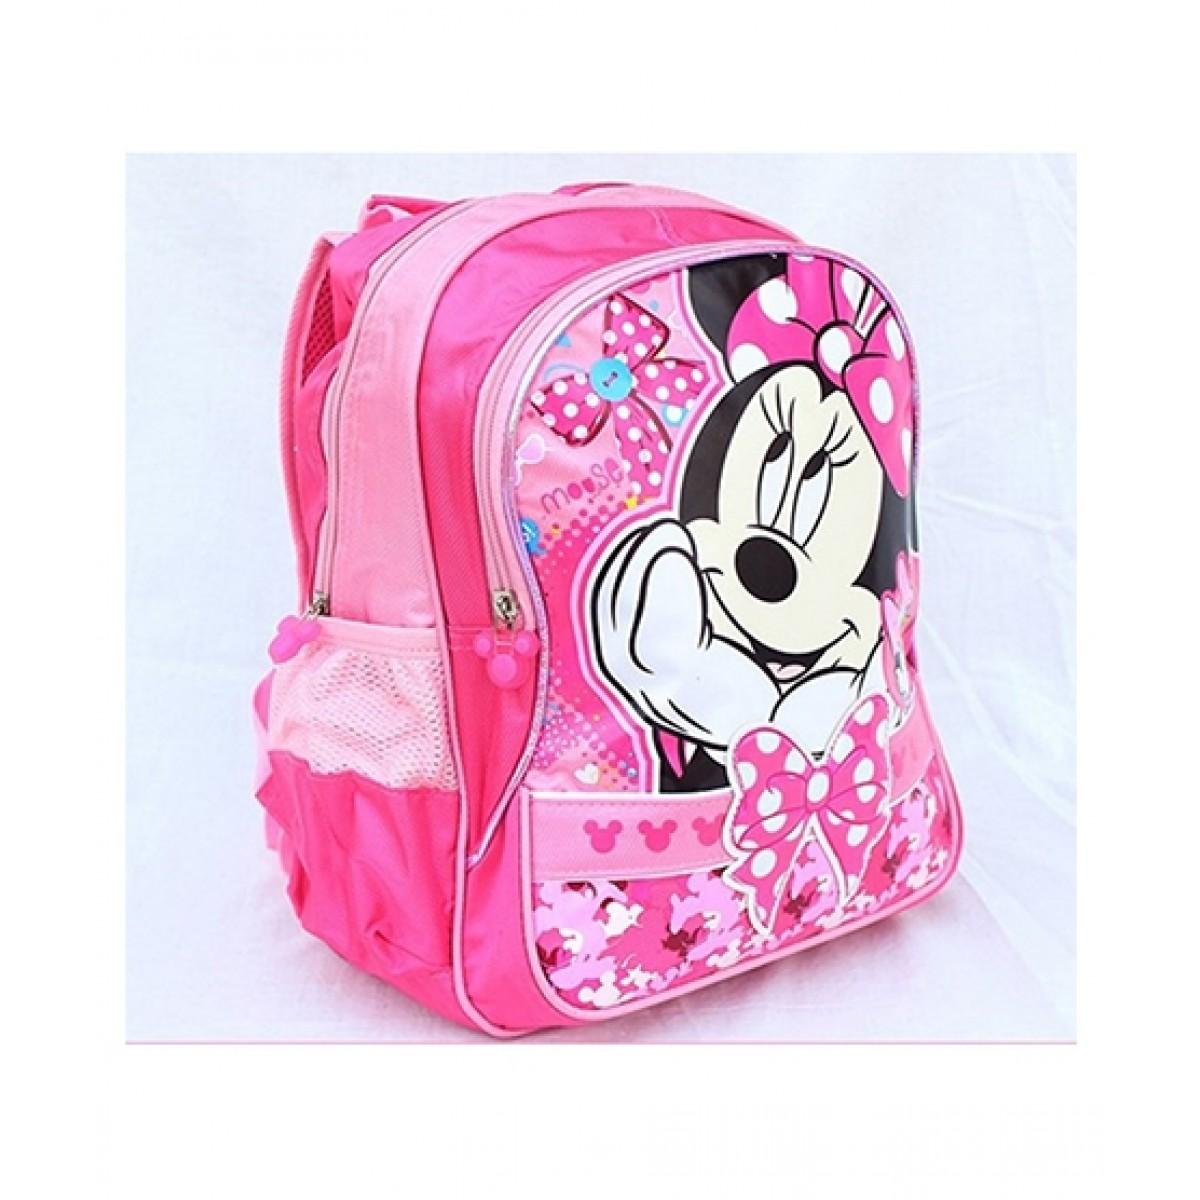 Zapple Mickey Mouse School Bag Price in Pakistan